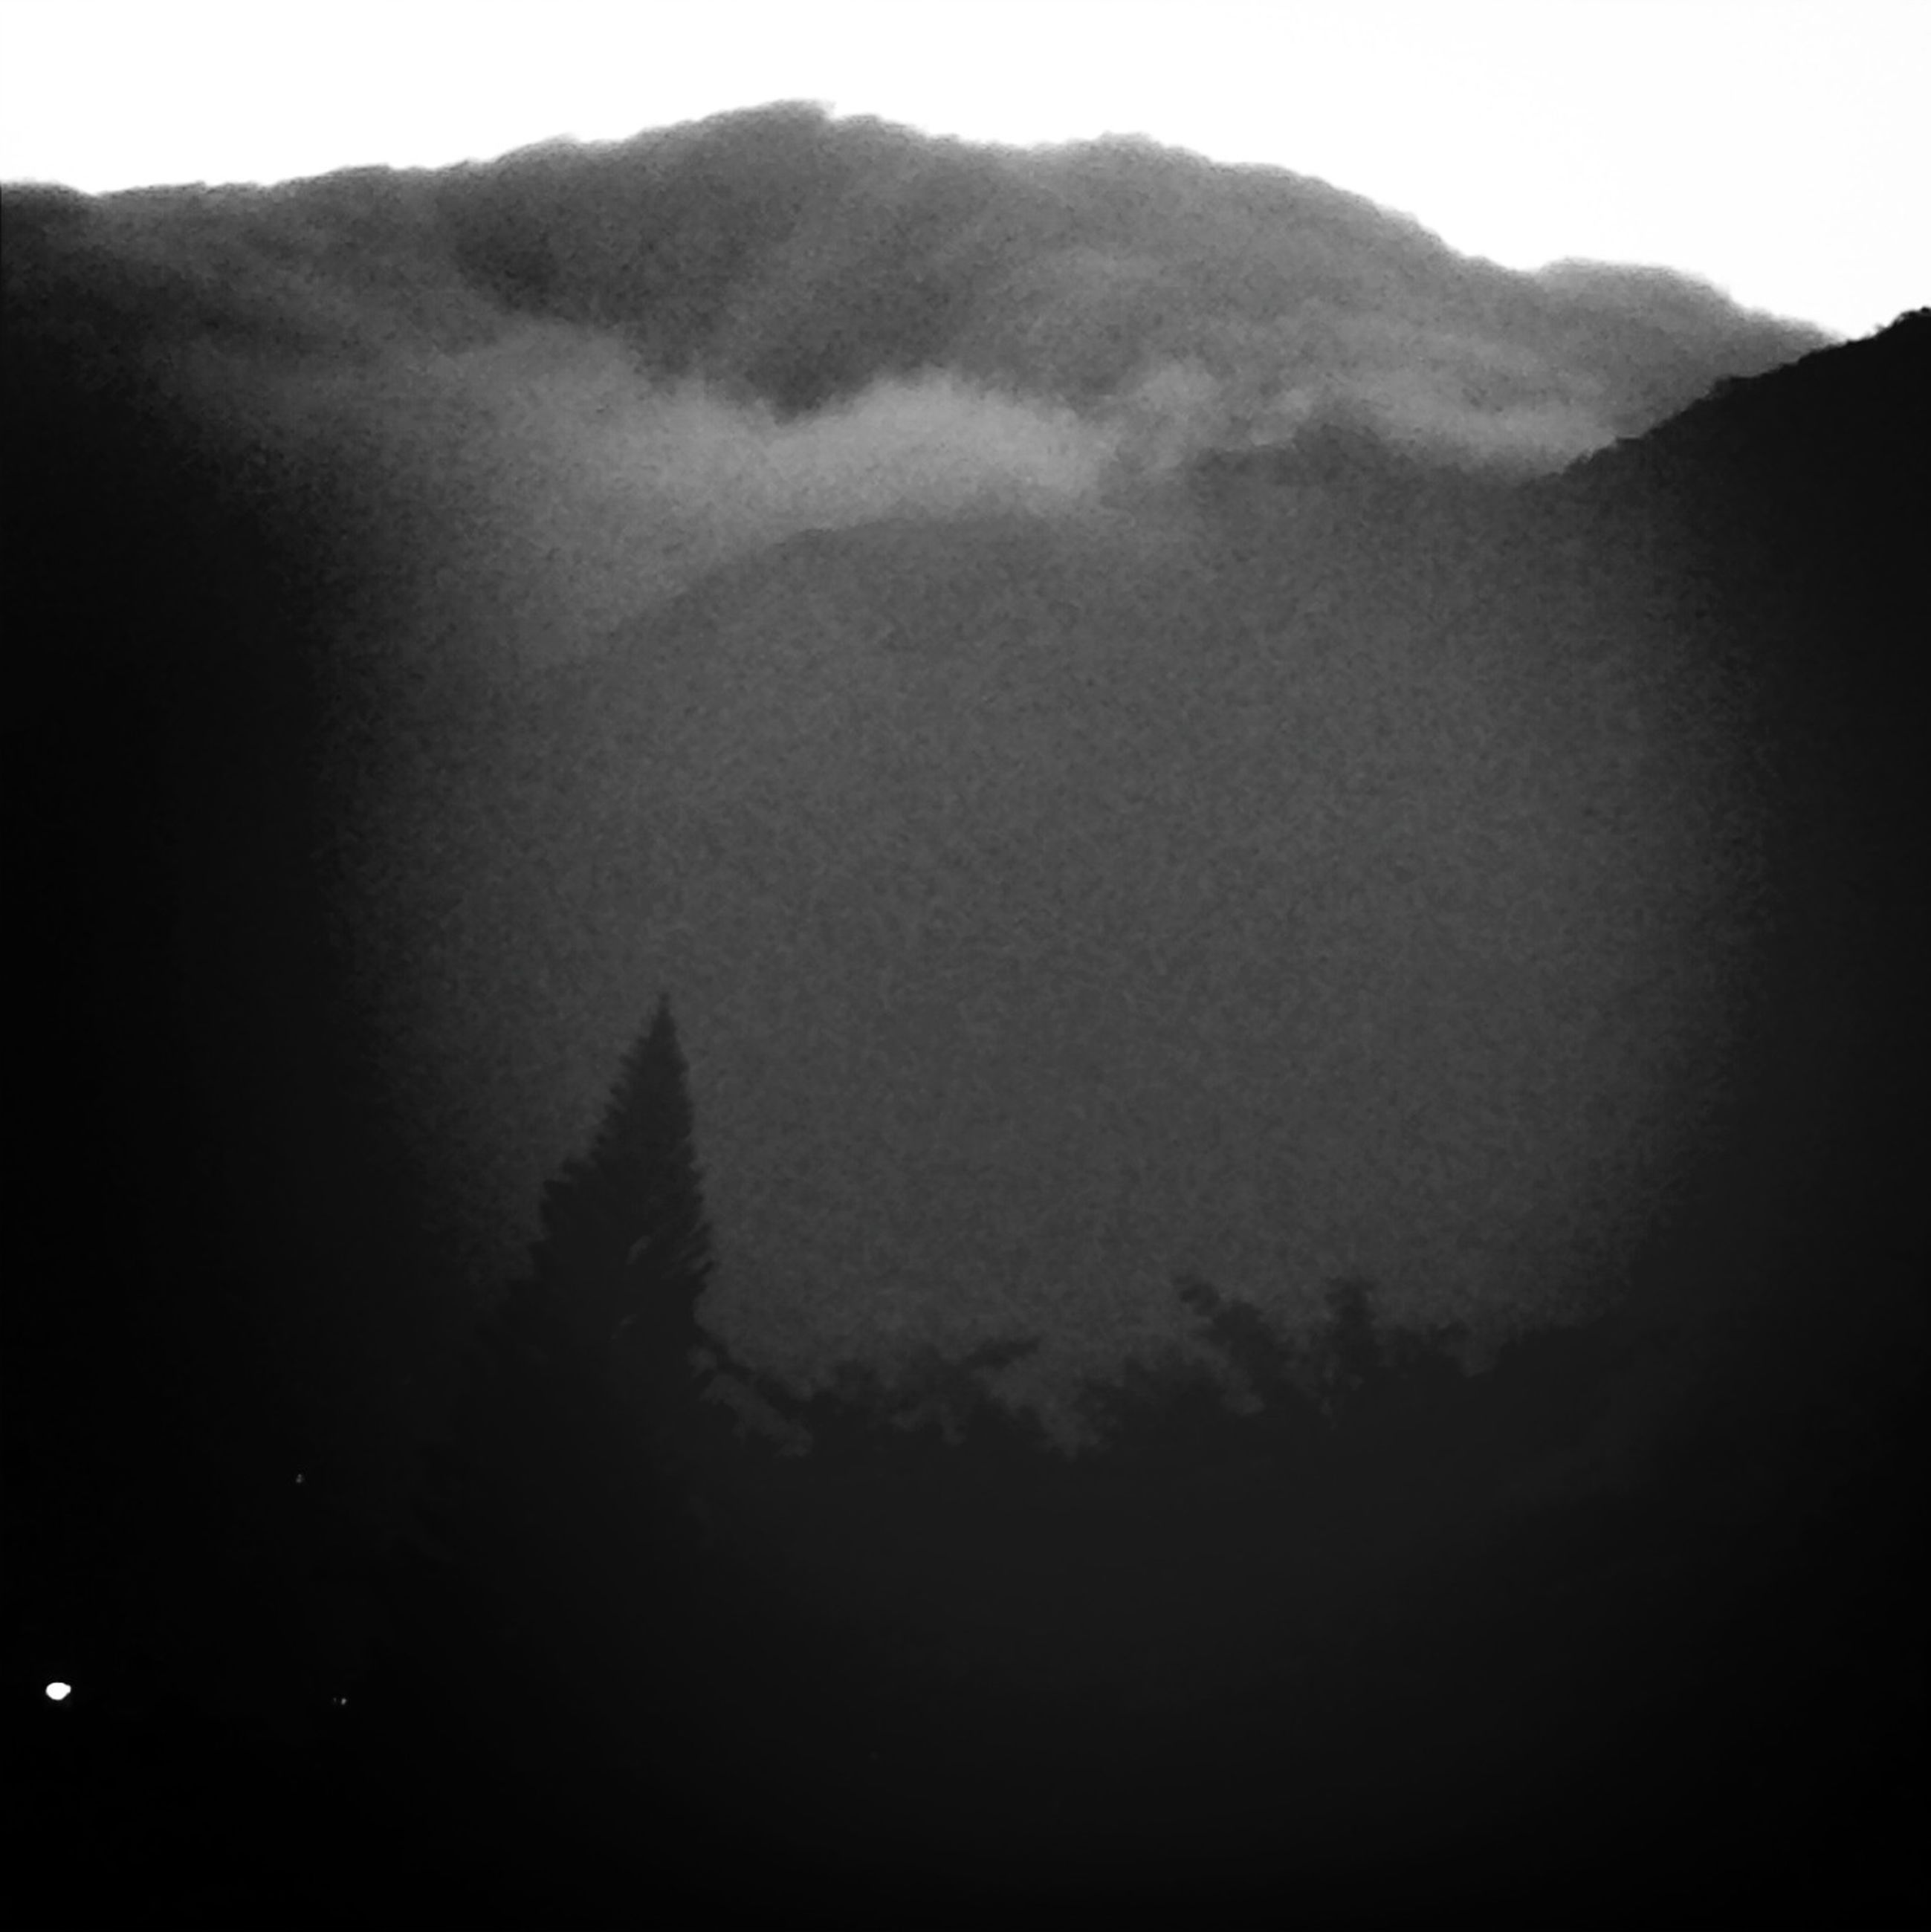 mountain, tranquil scene, tranquility, scenics, mountain range, beauty in nature, fog, landscape, nature, silhouette, sky, tree, idyllic, non-urban scene, foggy, outdoors, remote, dusk, no people, dark